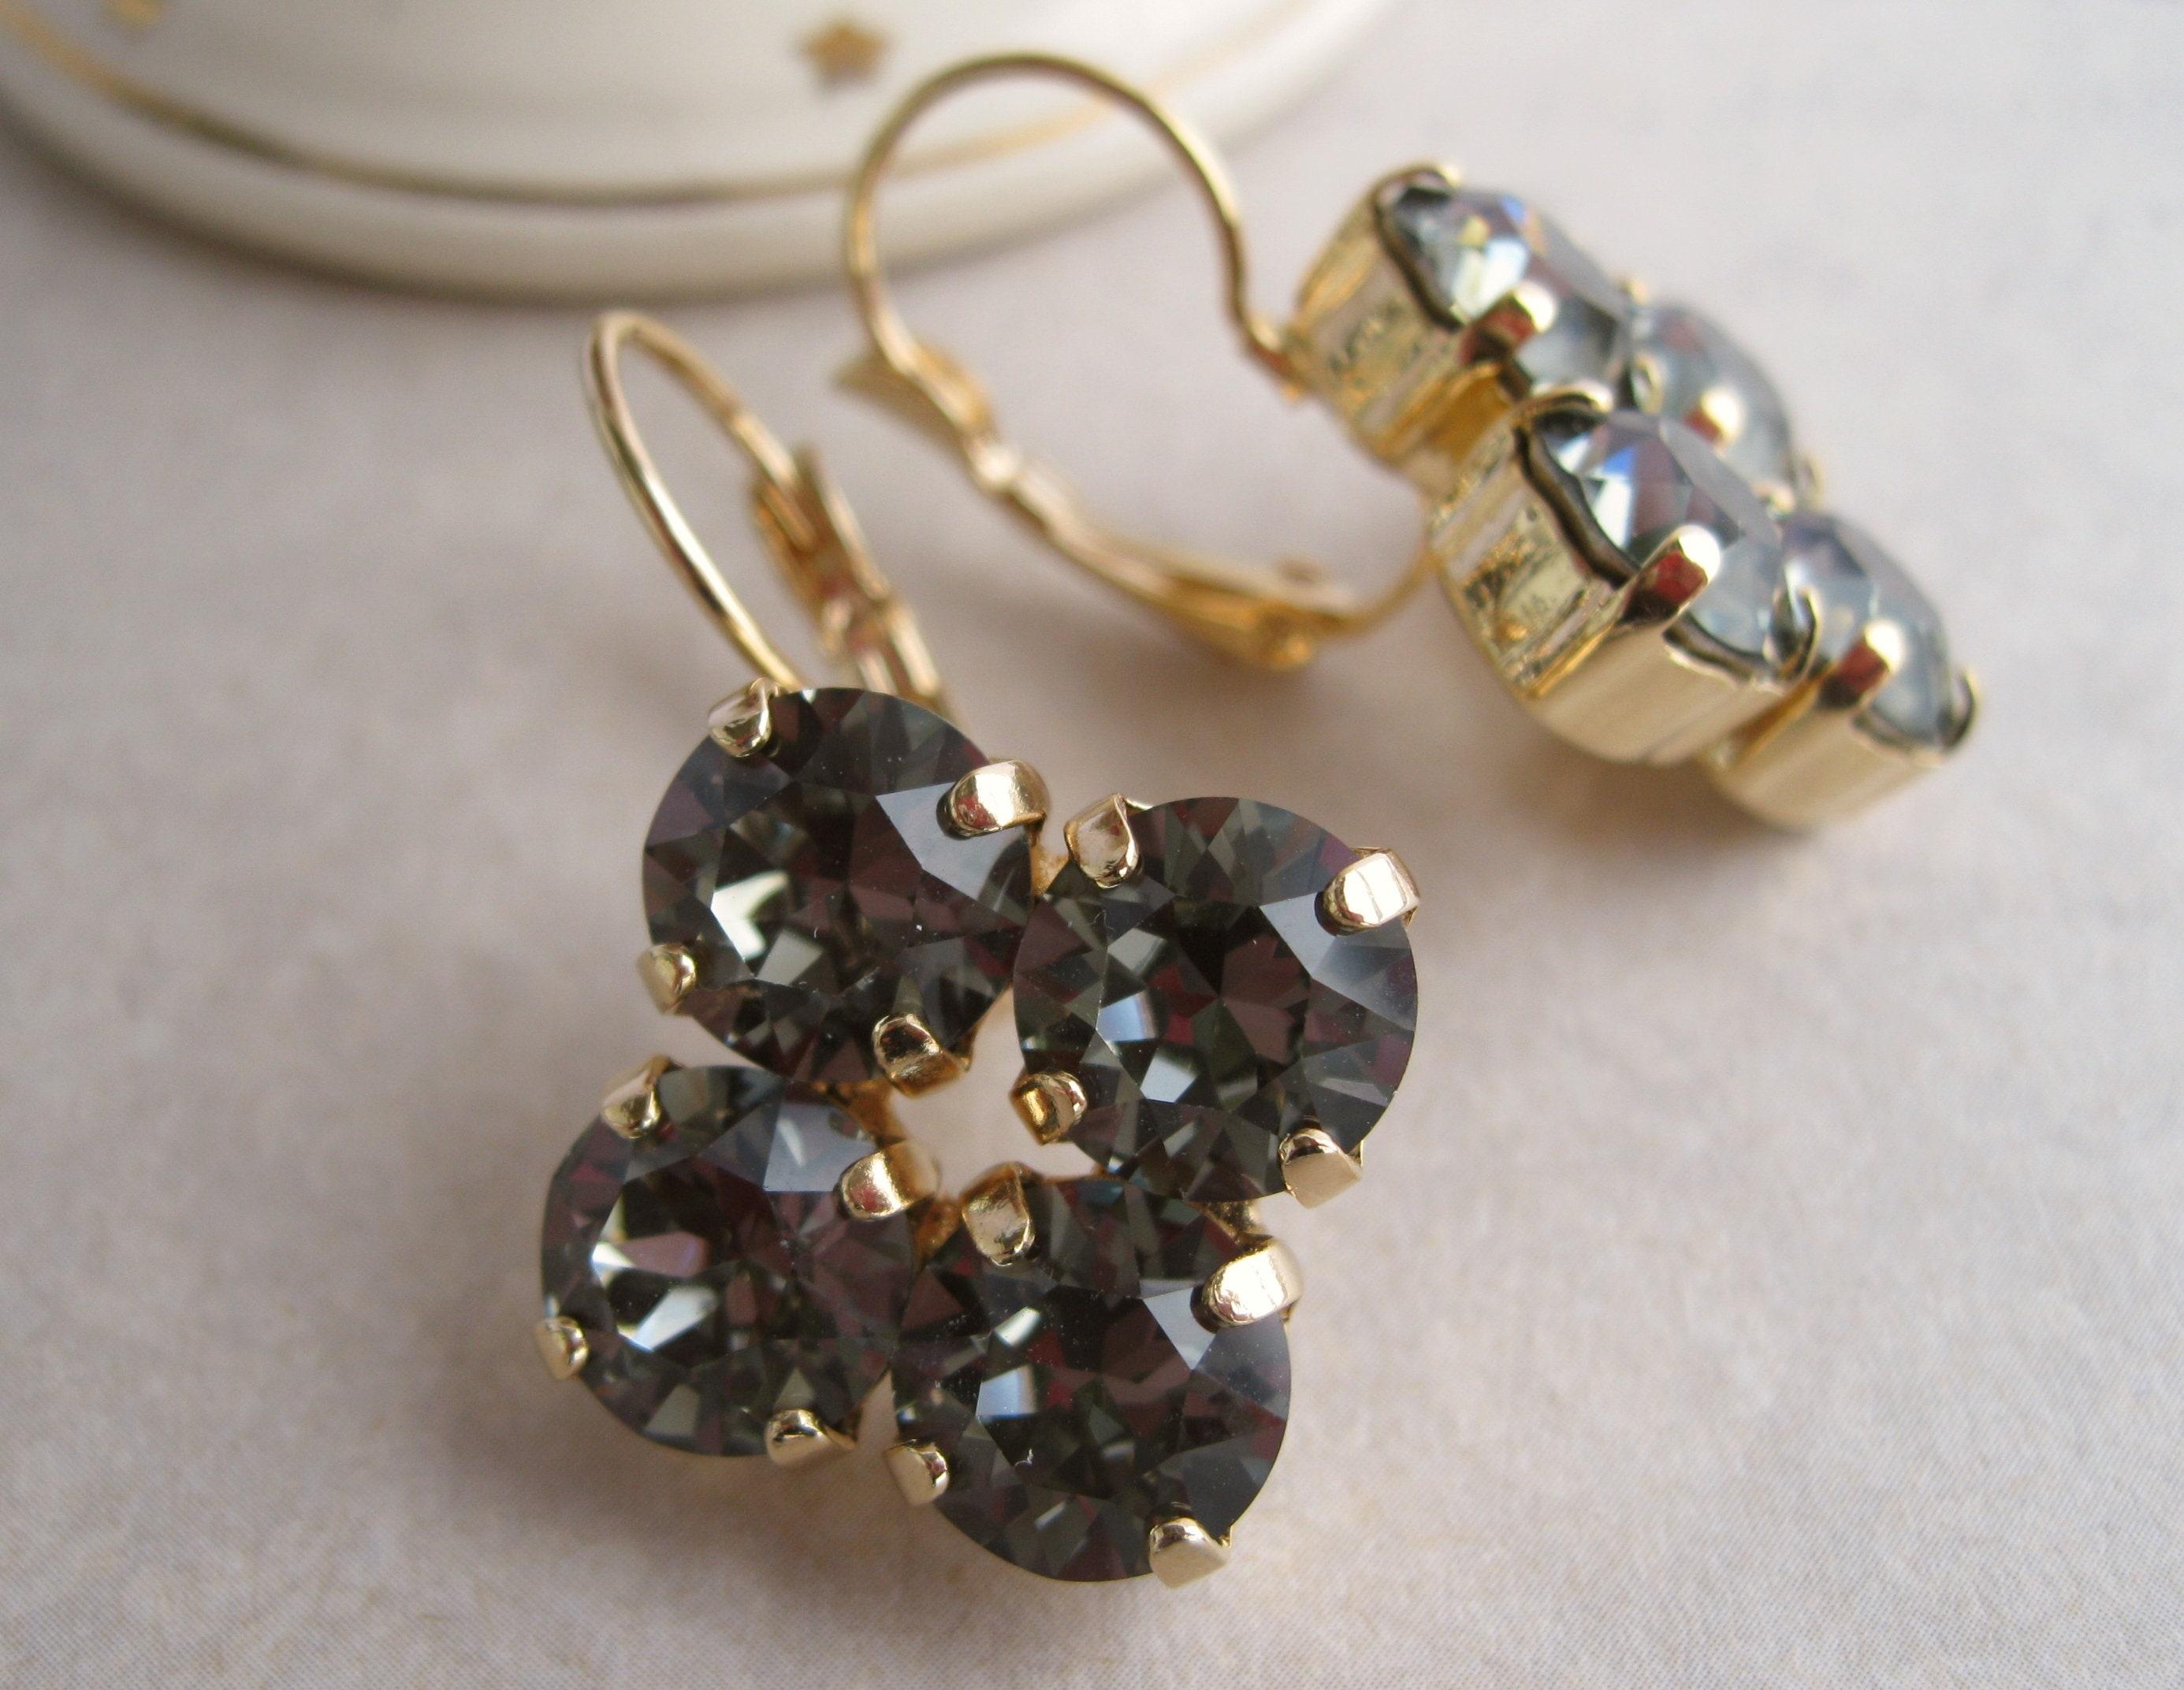 f60fdbc5c Gold and Black Rhinestone Earrings Swarovski crystals Black Diamond  Bridesmaid Jewelry Art Deco Statement Jewelry Leverback Nickel free